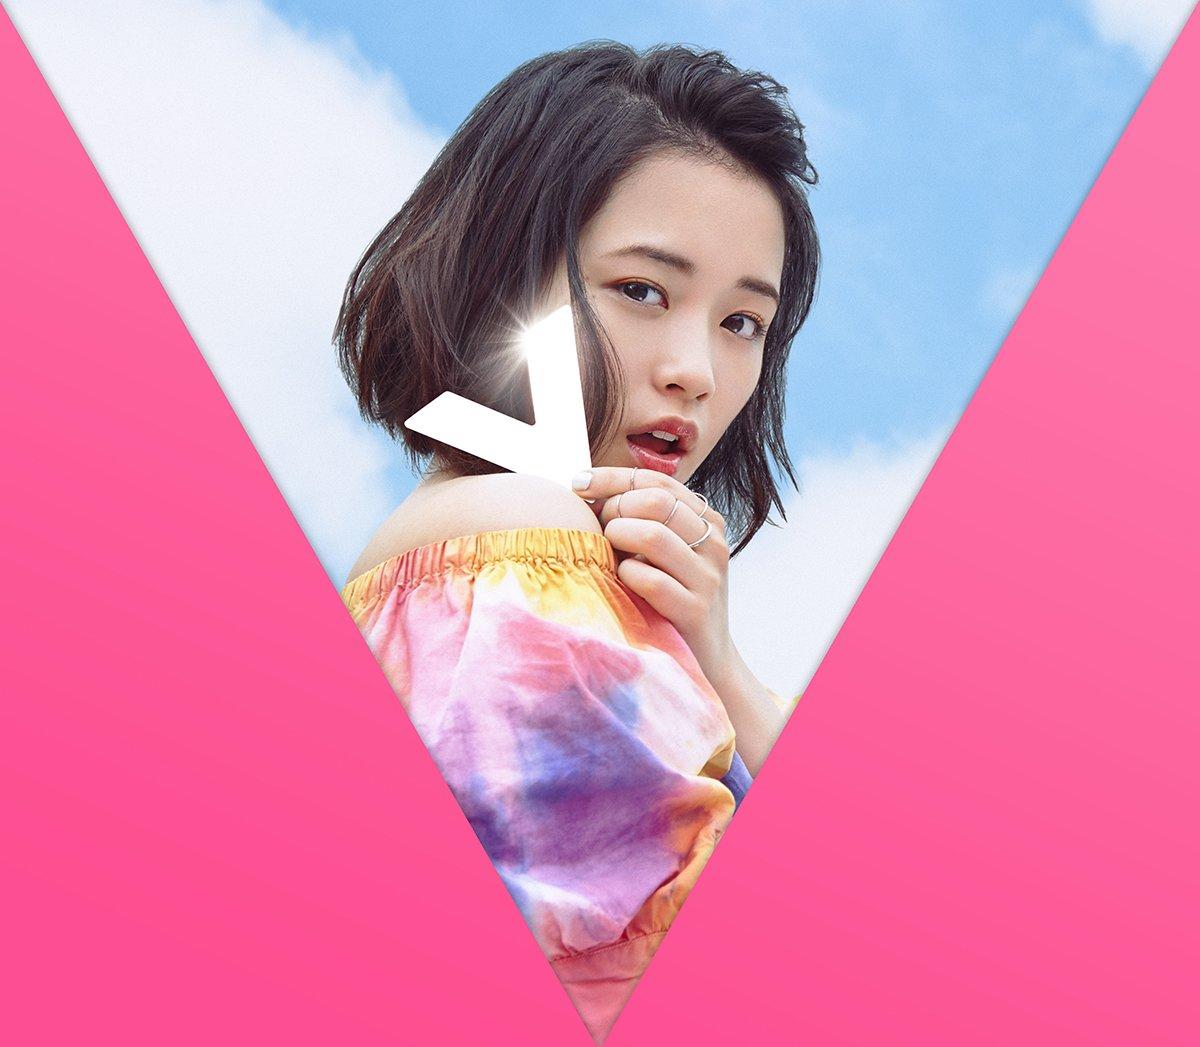 20160716.02.09 Sakurako Ohara - V (M4A) cover 3.jpg